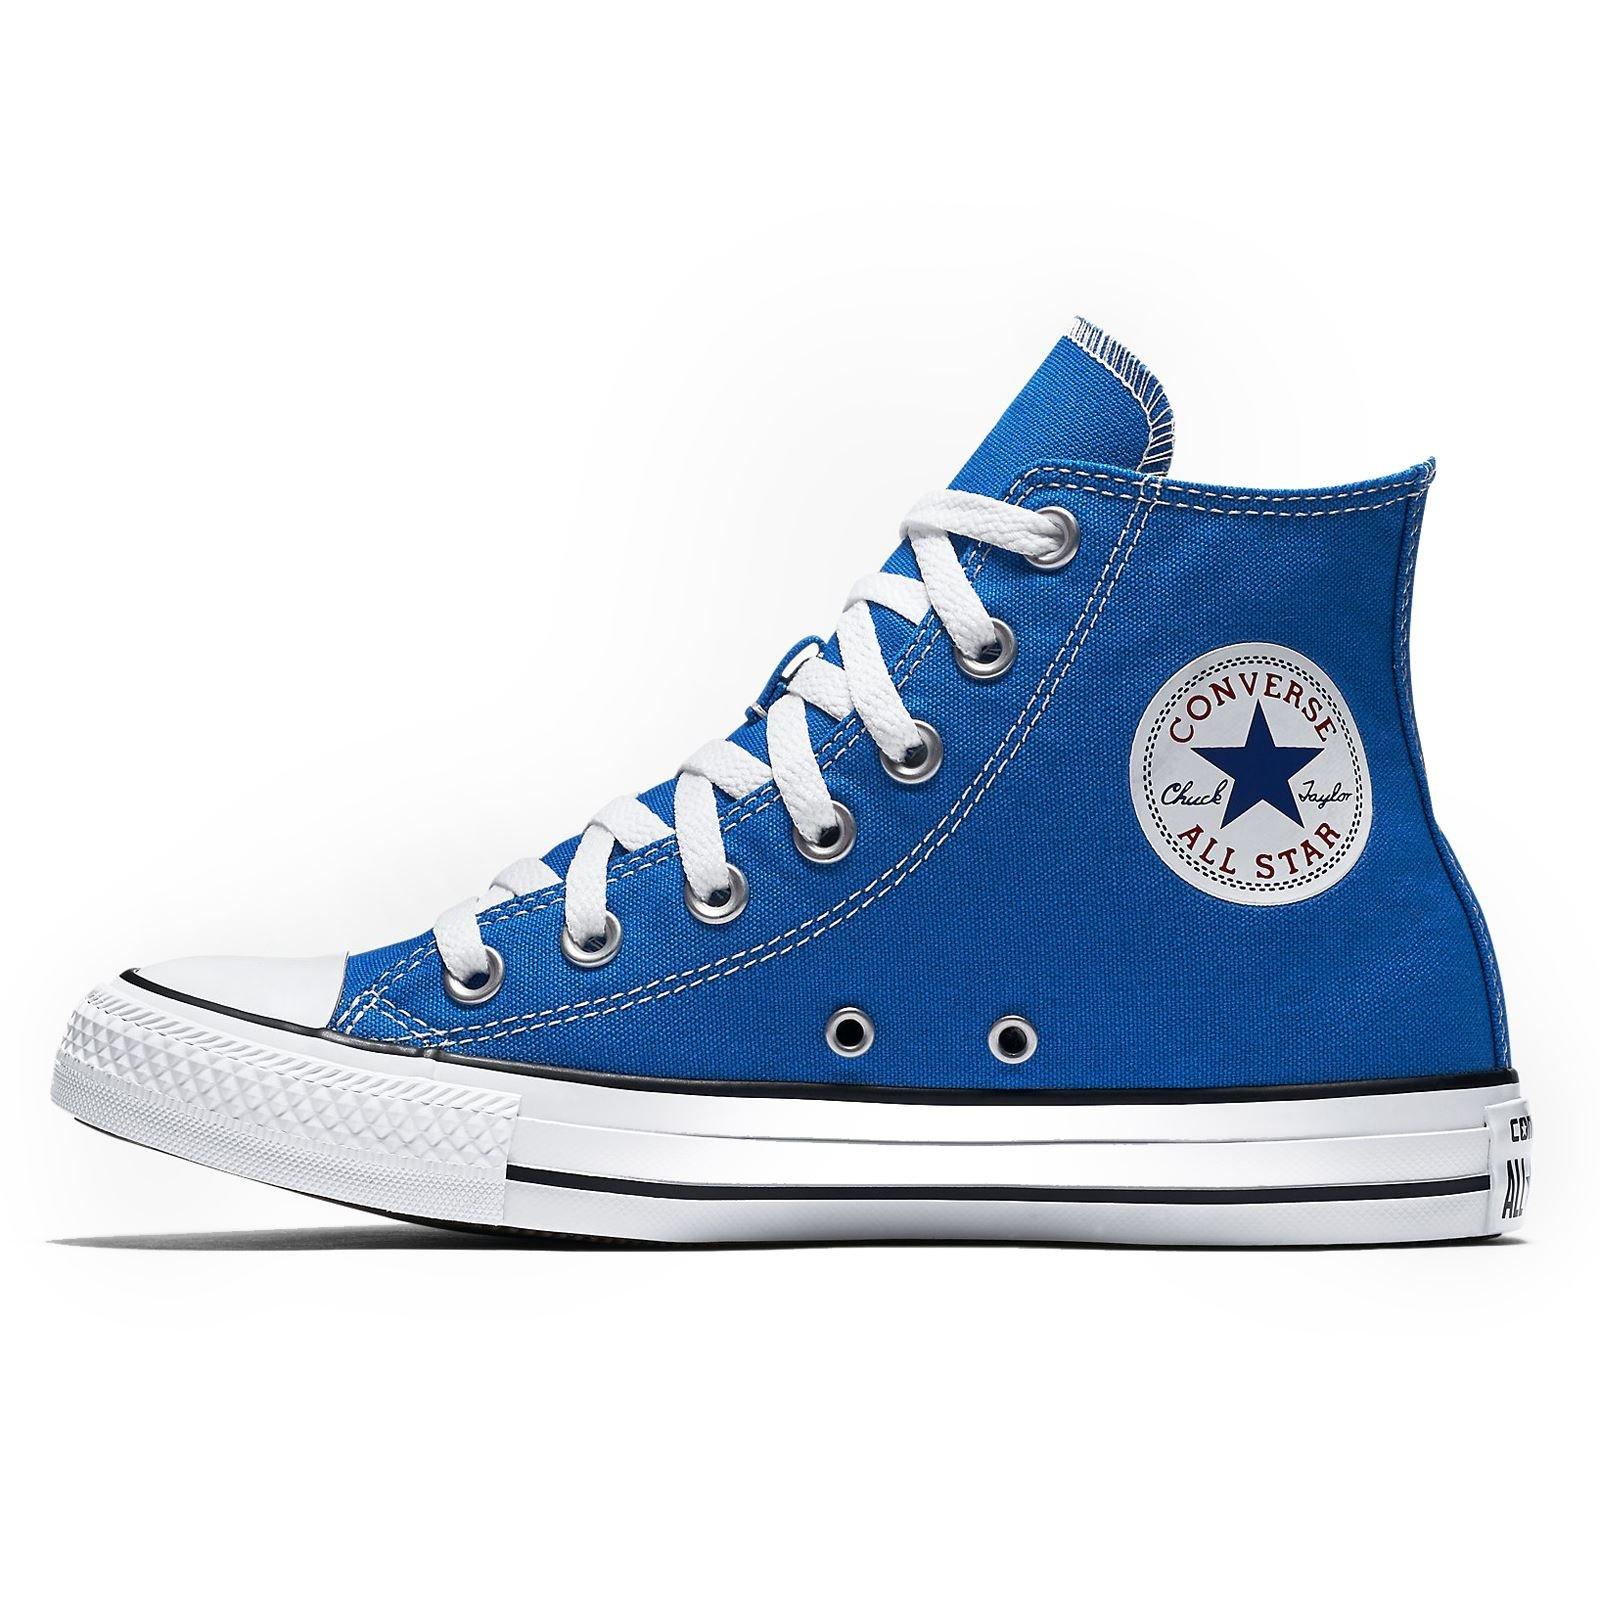 Converse Unisex Shoes Chuck Taylor All Star Hi Soar Blue Fashion Sneakers (4 Men's / 6 Women's)